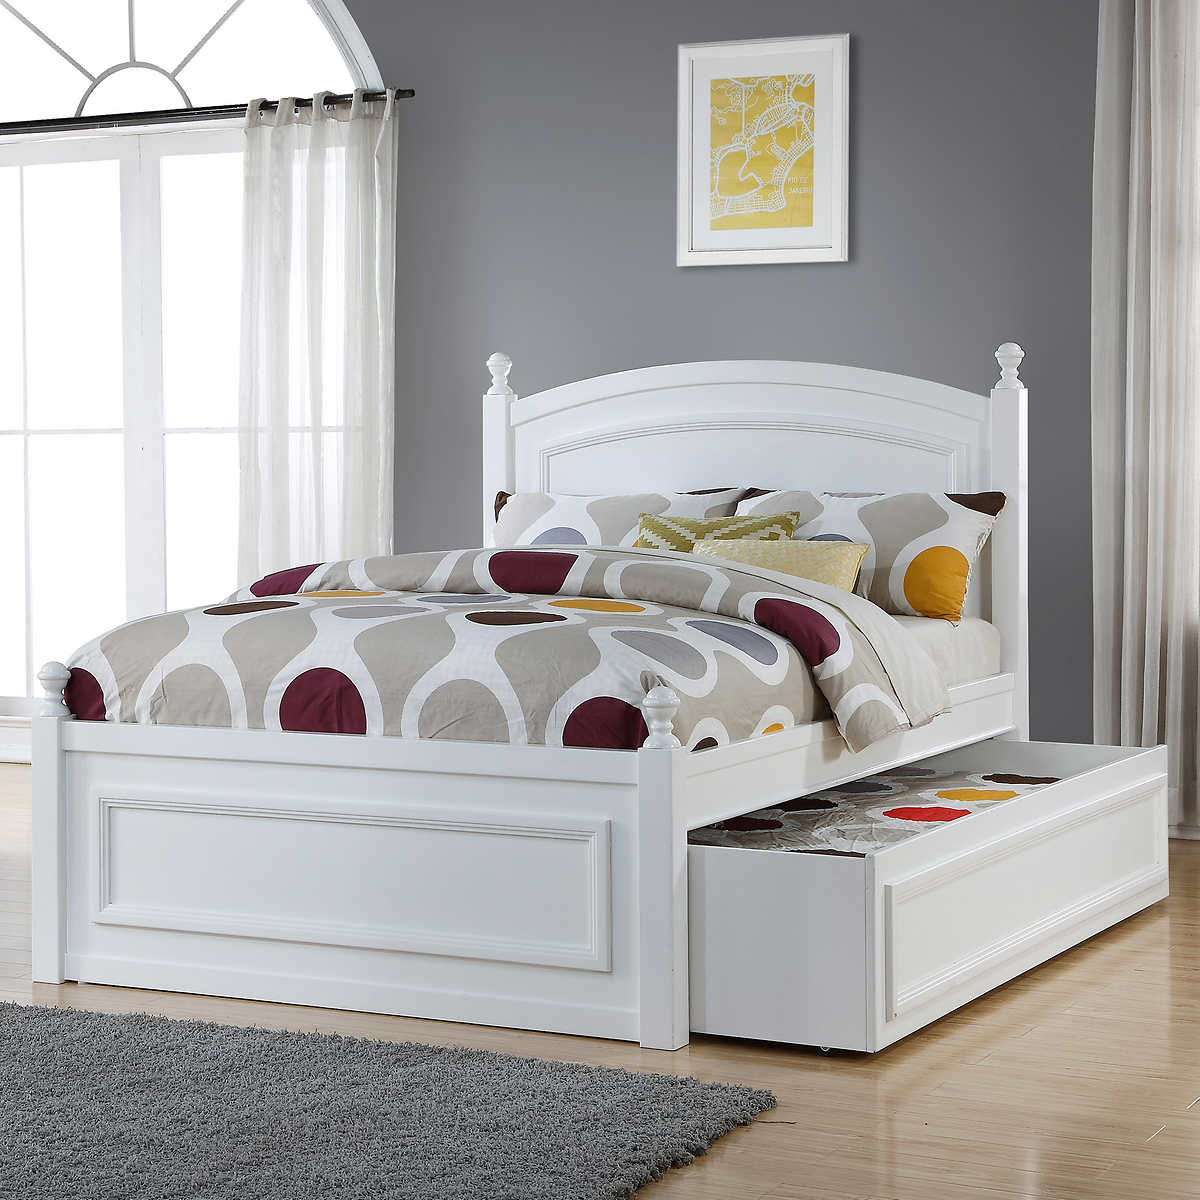 tempat-tidur-anak-minimalis-cat-duco